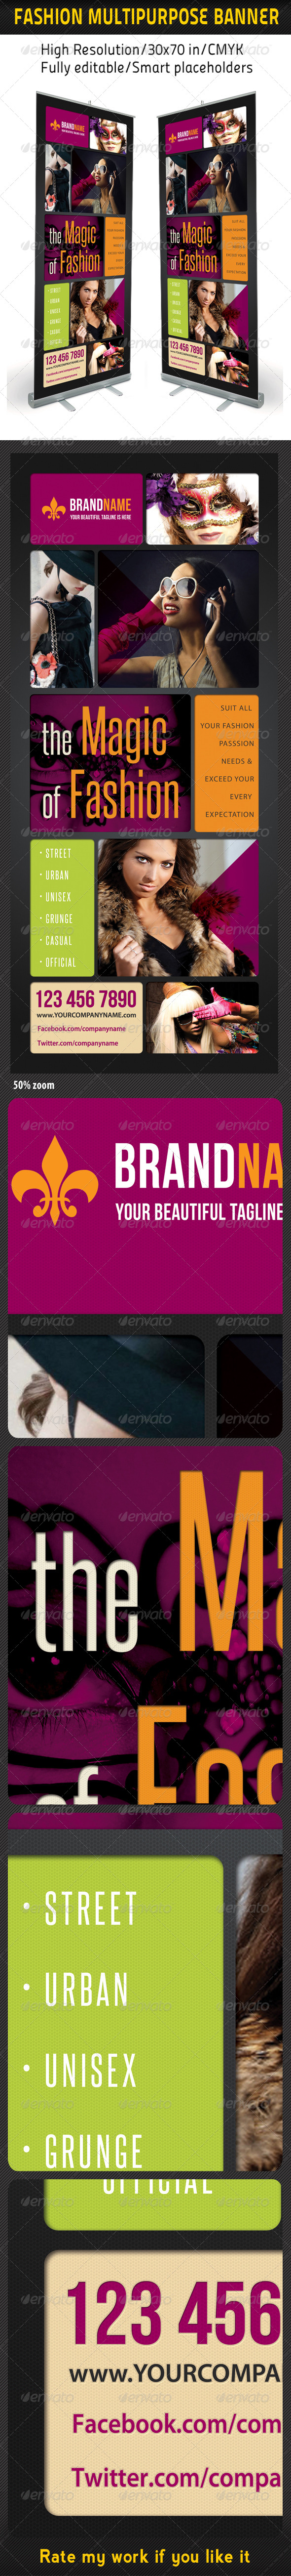 Fashion Multipurpose Banner Template 13 - Signage Print Templates